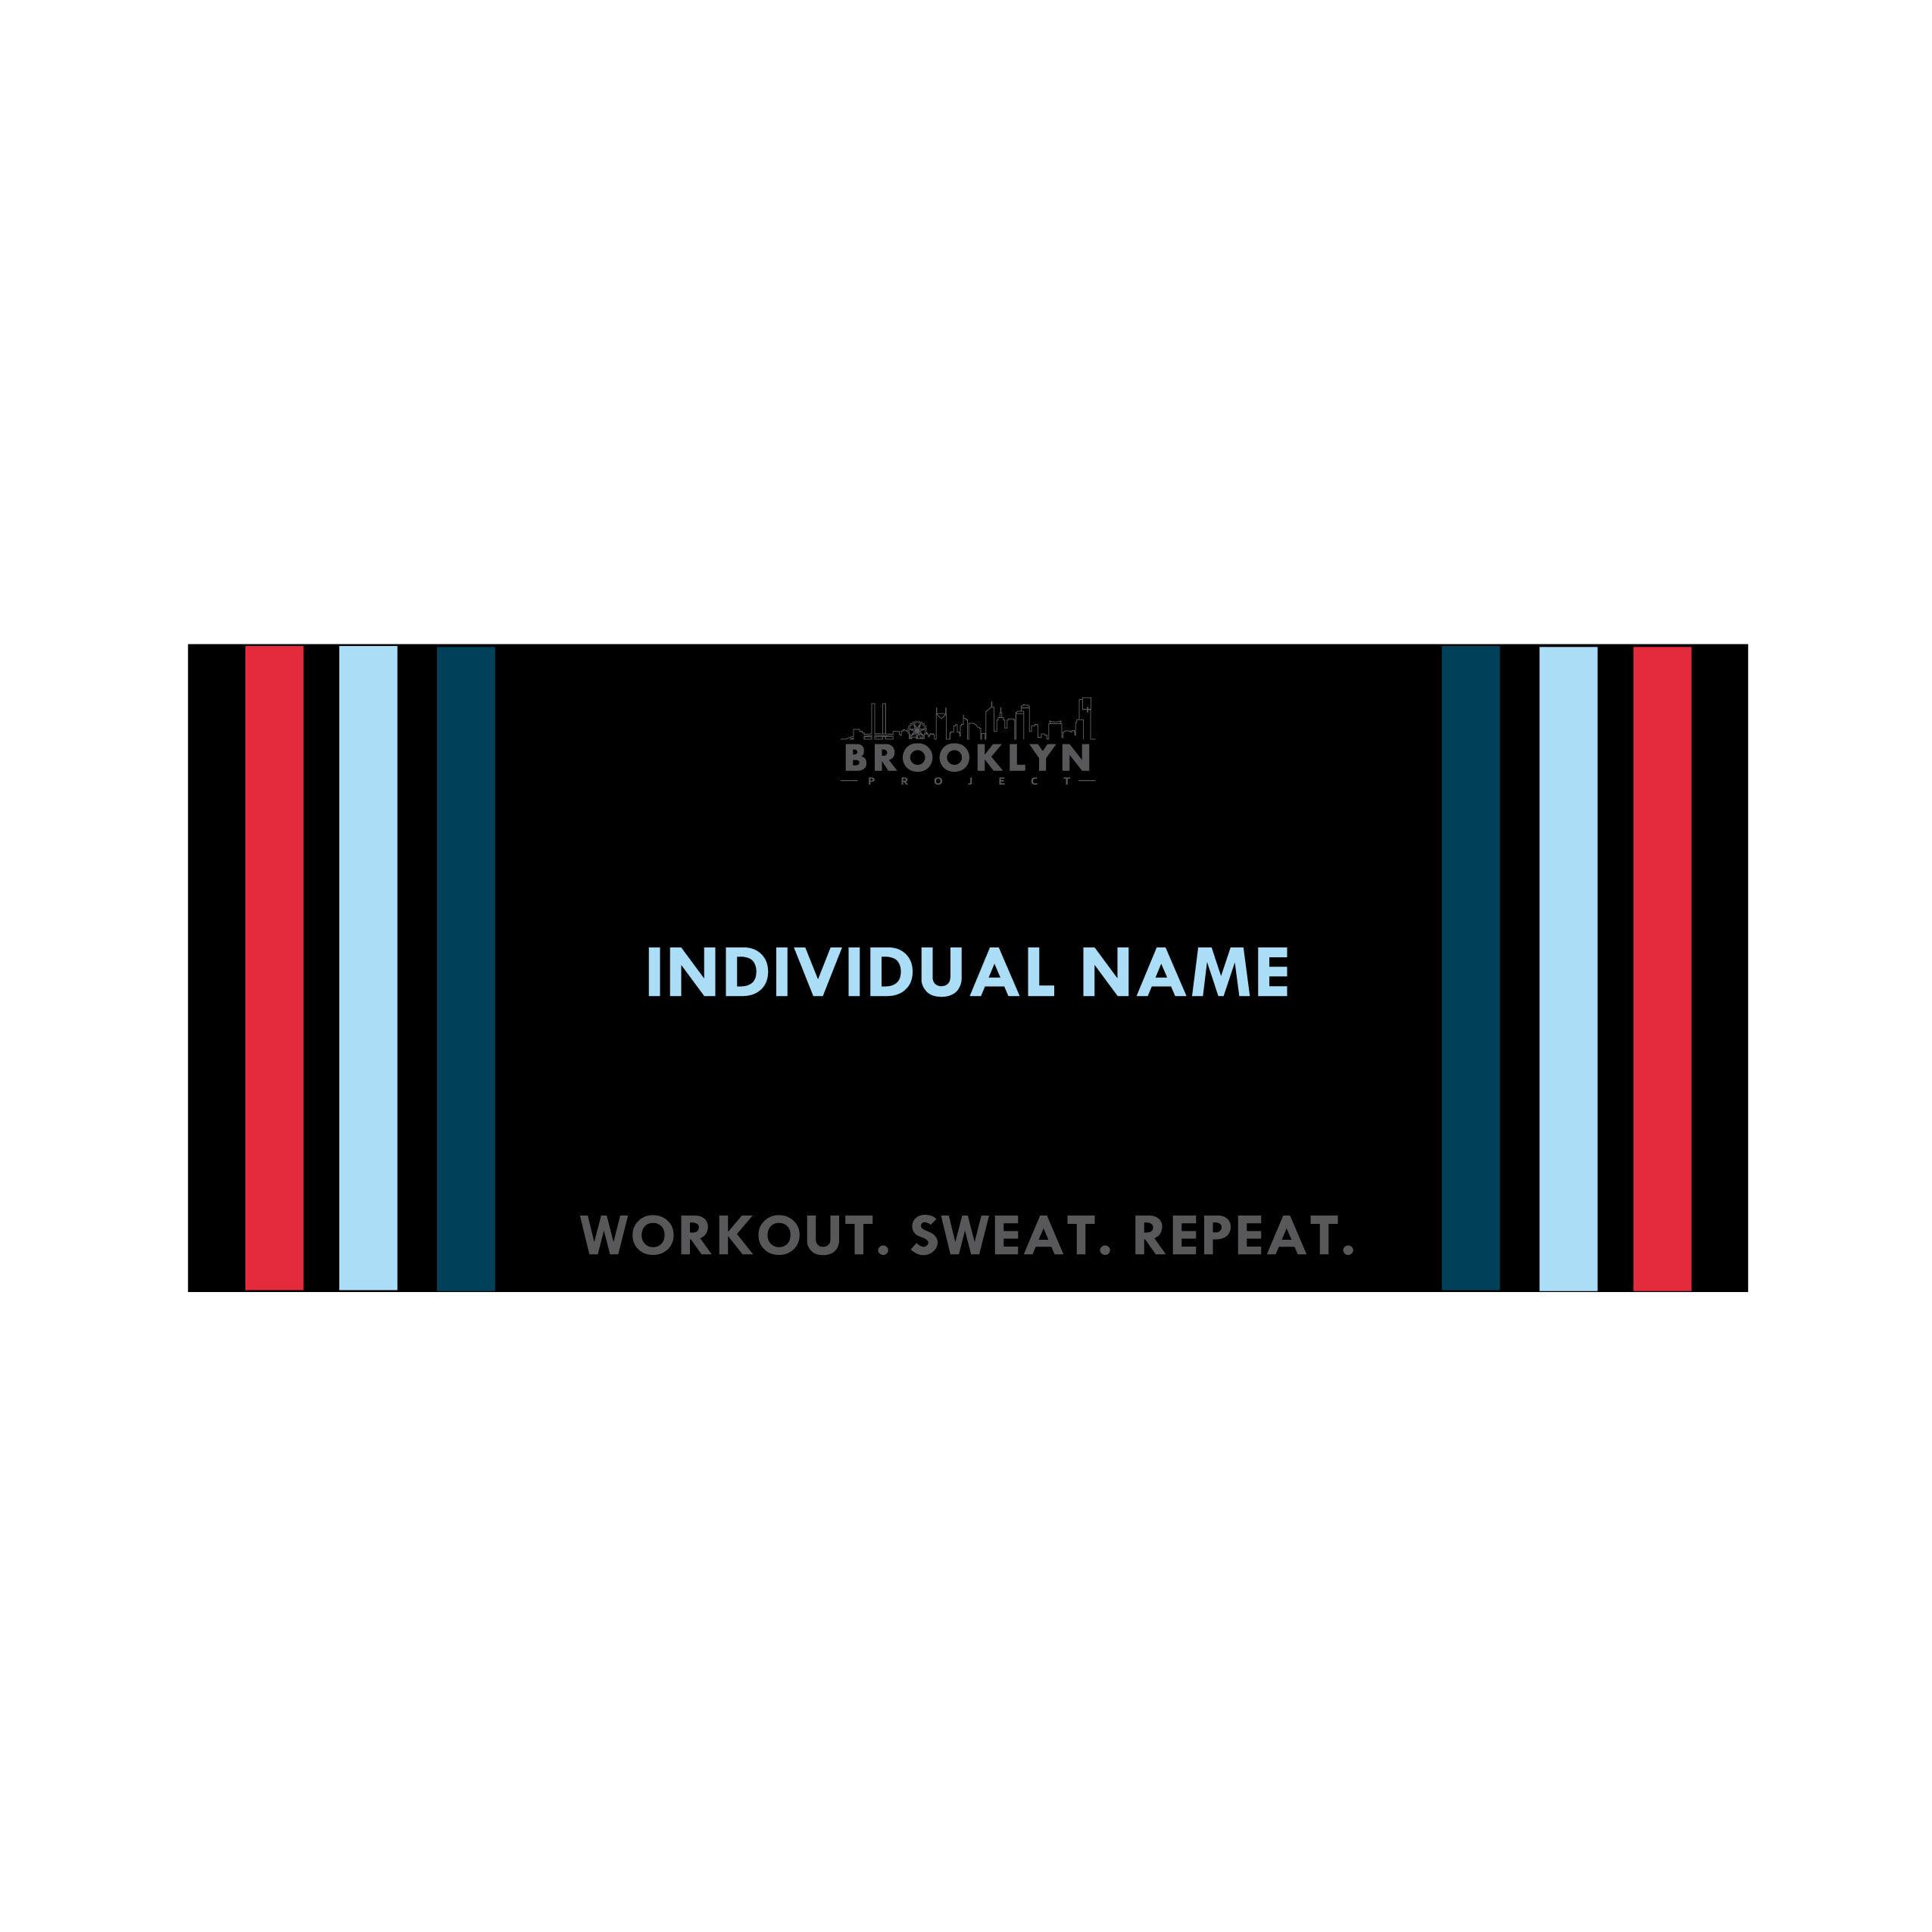 Individual-name